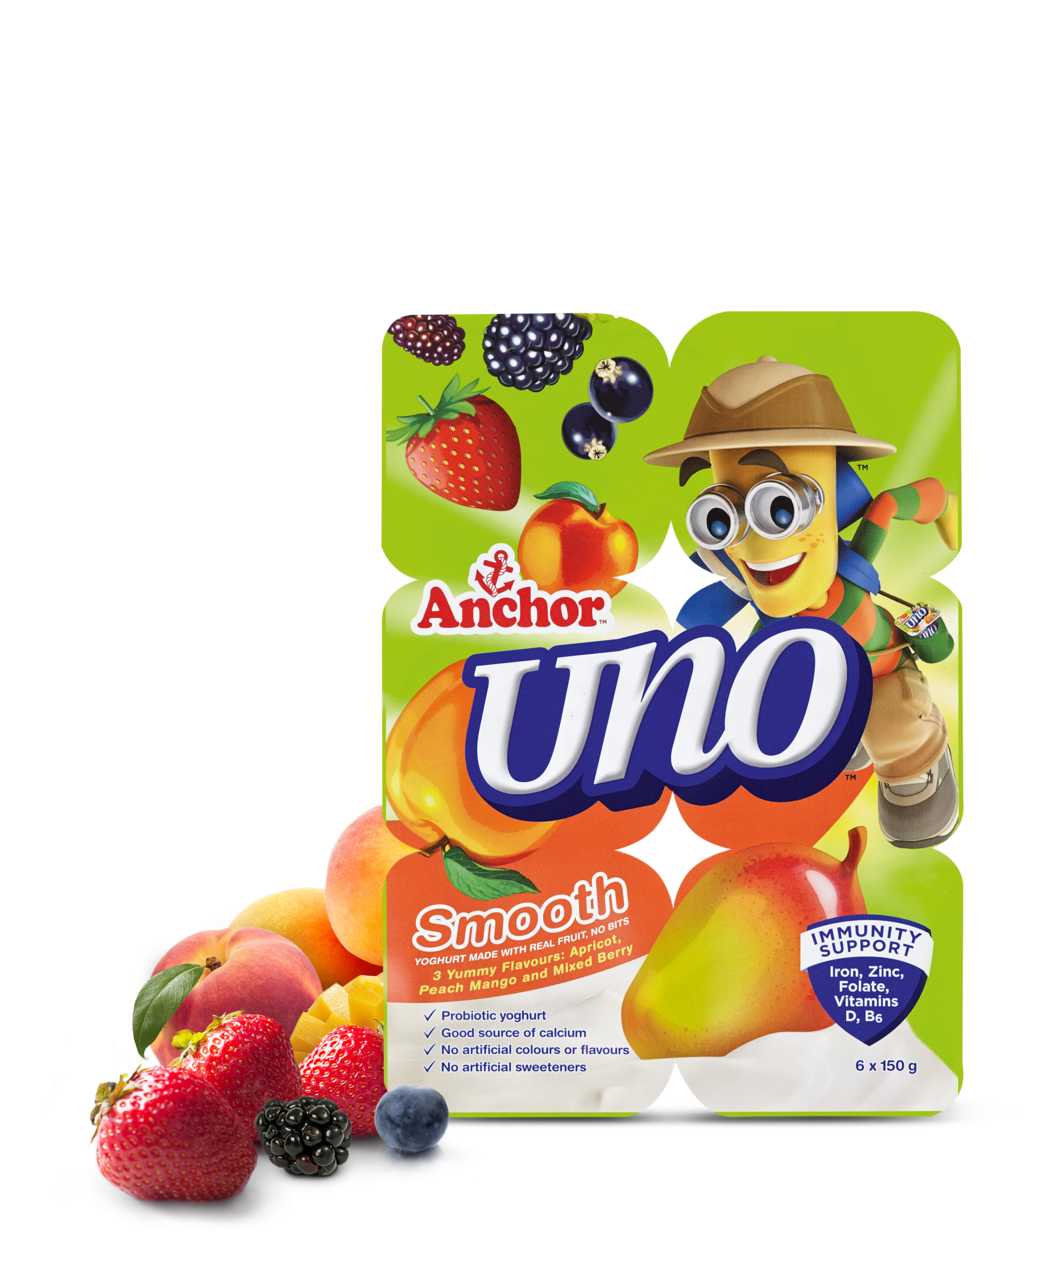 Anchor Uno Apricot, Peach, Mango & Mixed Berry Yoghurt 6 x 150g pack